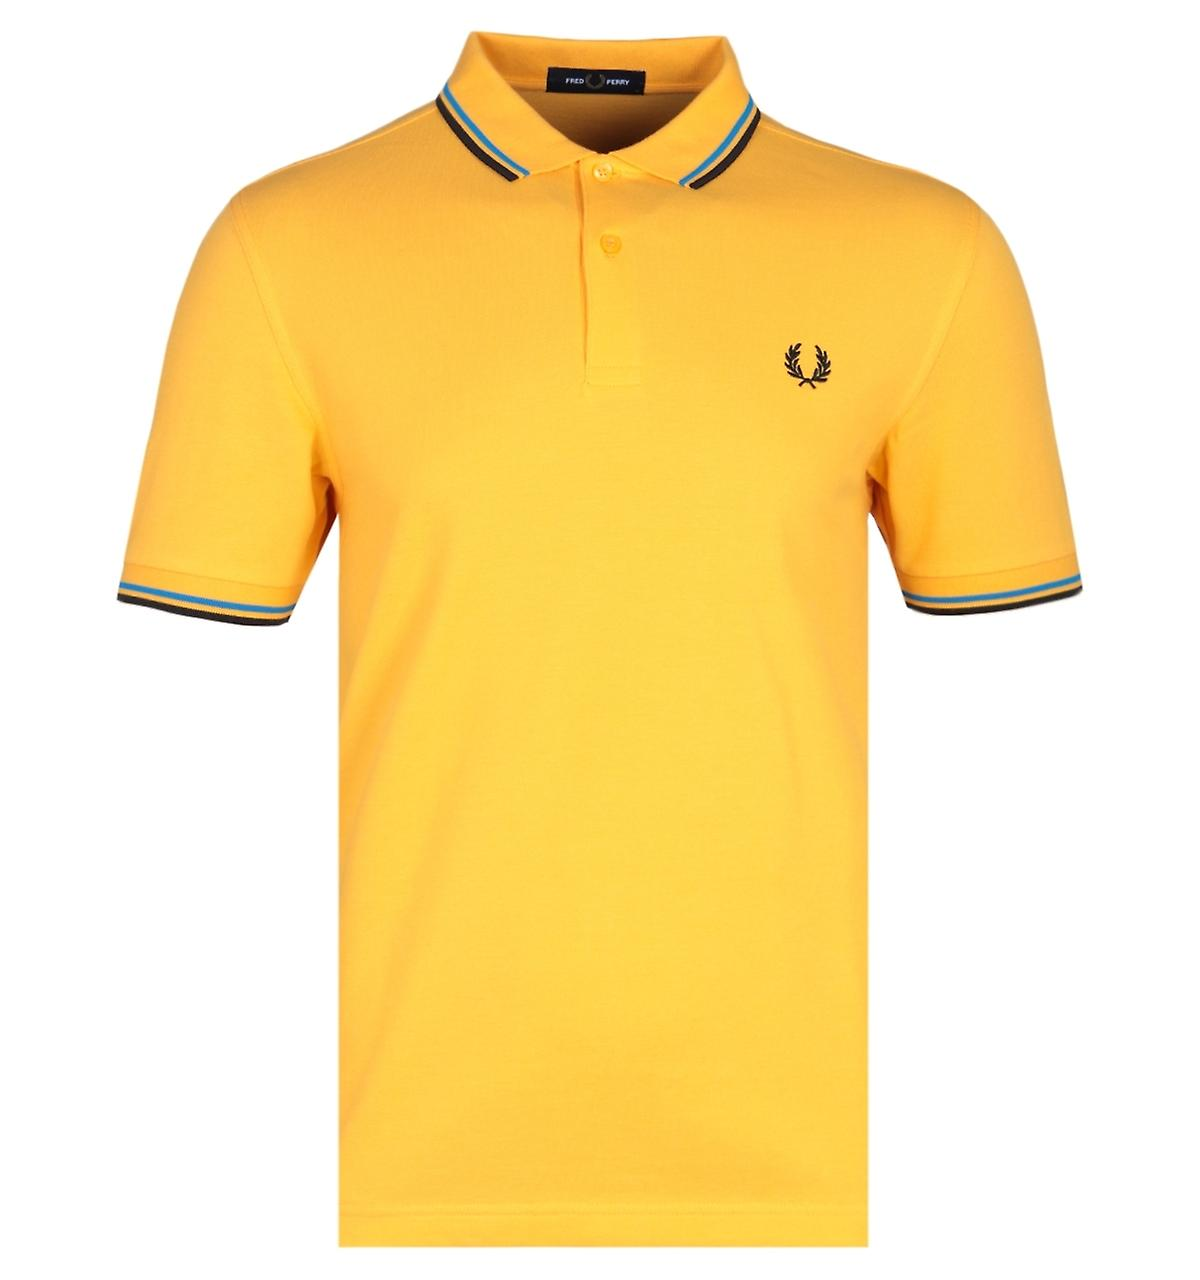 yellow polo shirt uniform